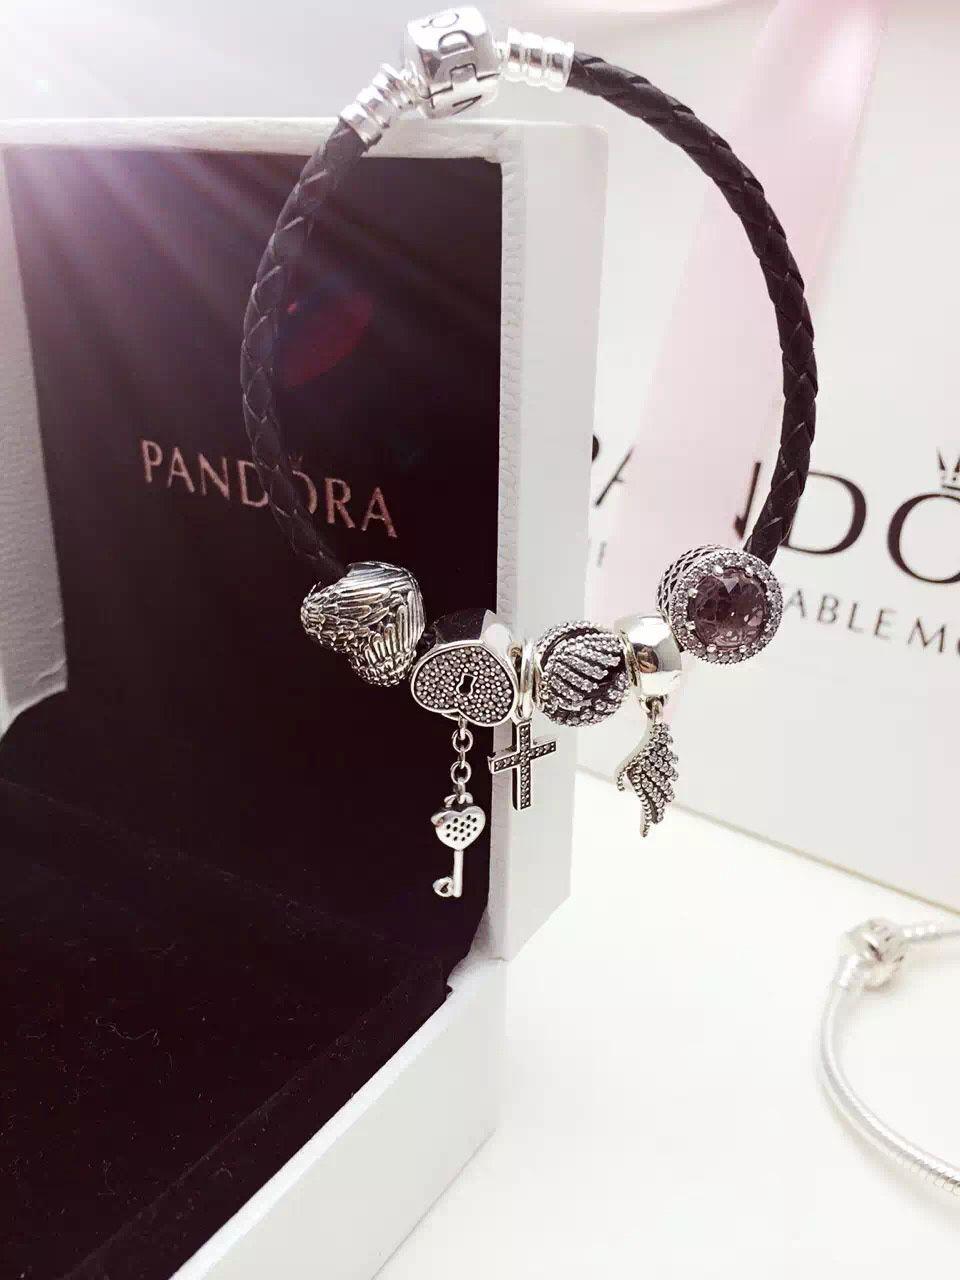 off pandora leather charm bracelet pink black hot sale